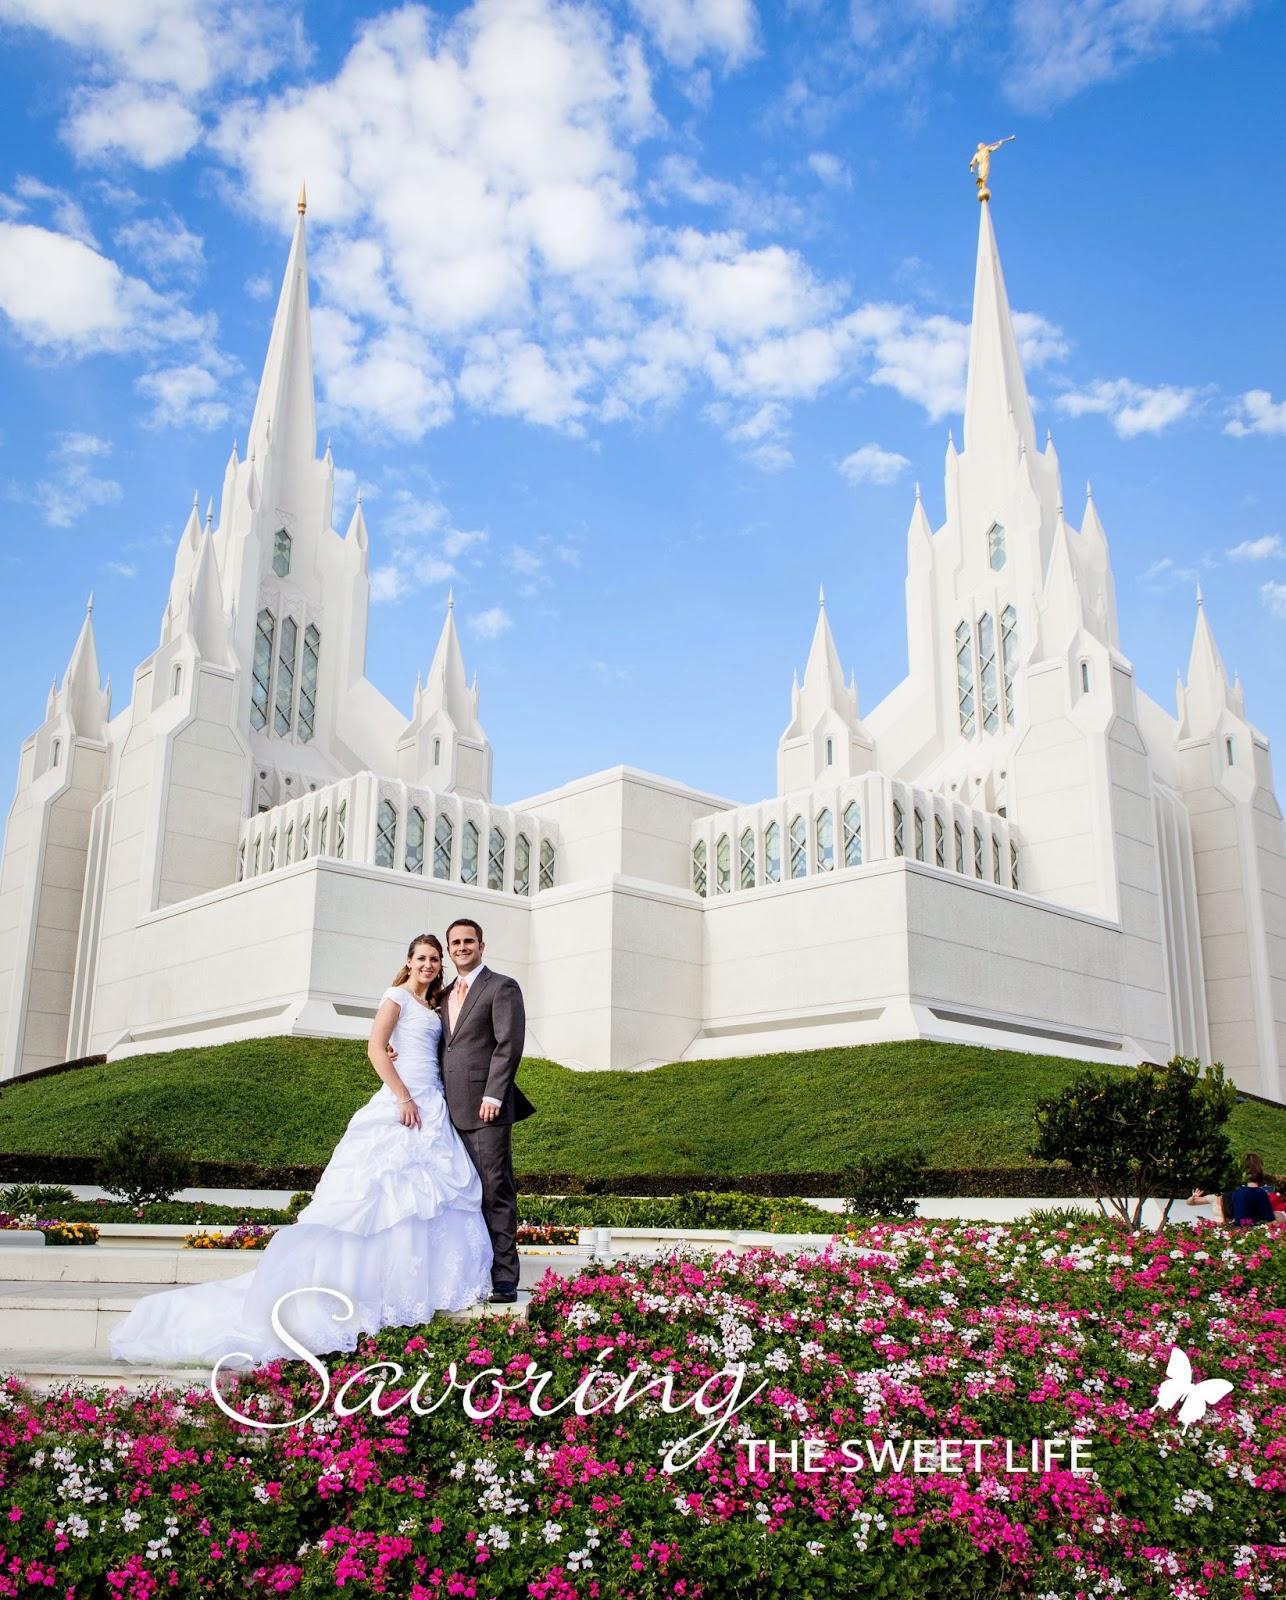 A Kinda Sad But Ultimately Sweet Story Kara And Ryans Wedding Portraits San Diego LDS Mormon Temple Engagement Photographer